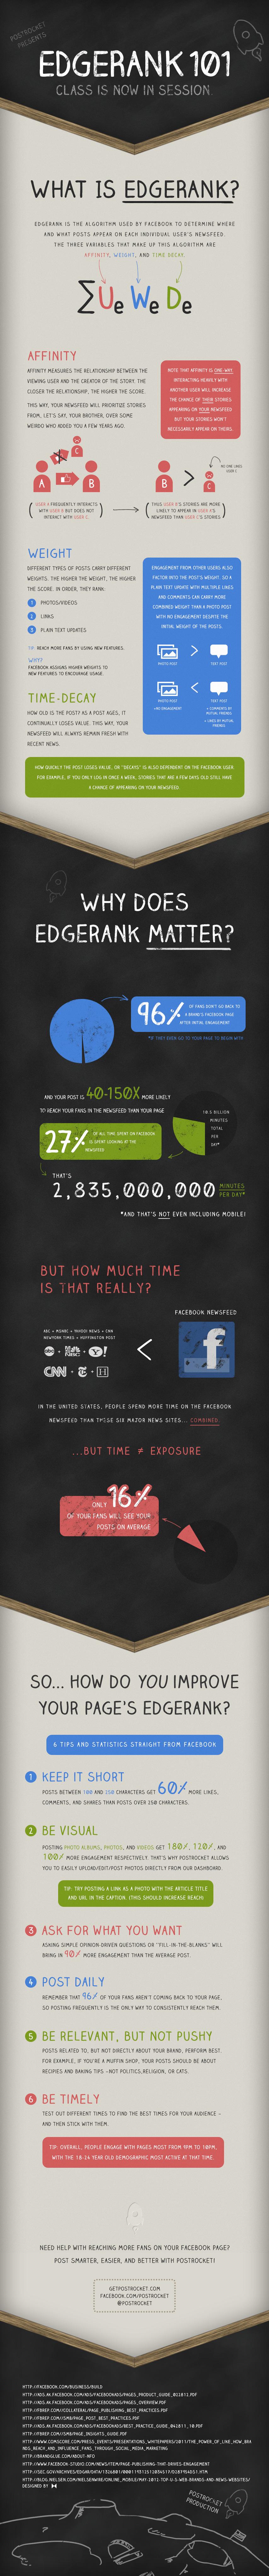 postrocket-facebook-edgerank-infographic1